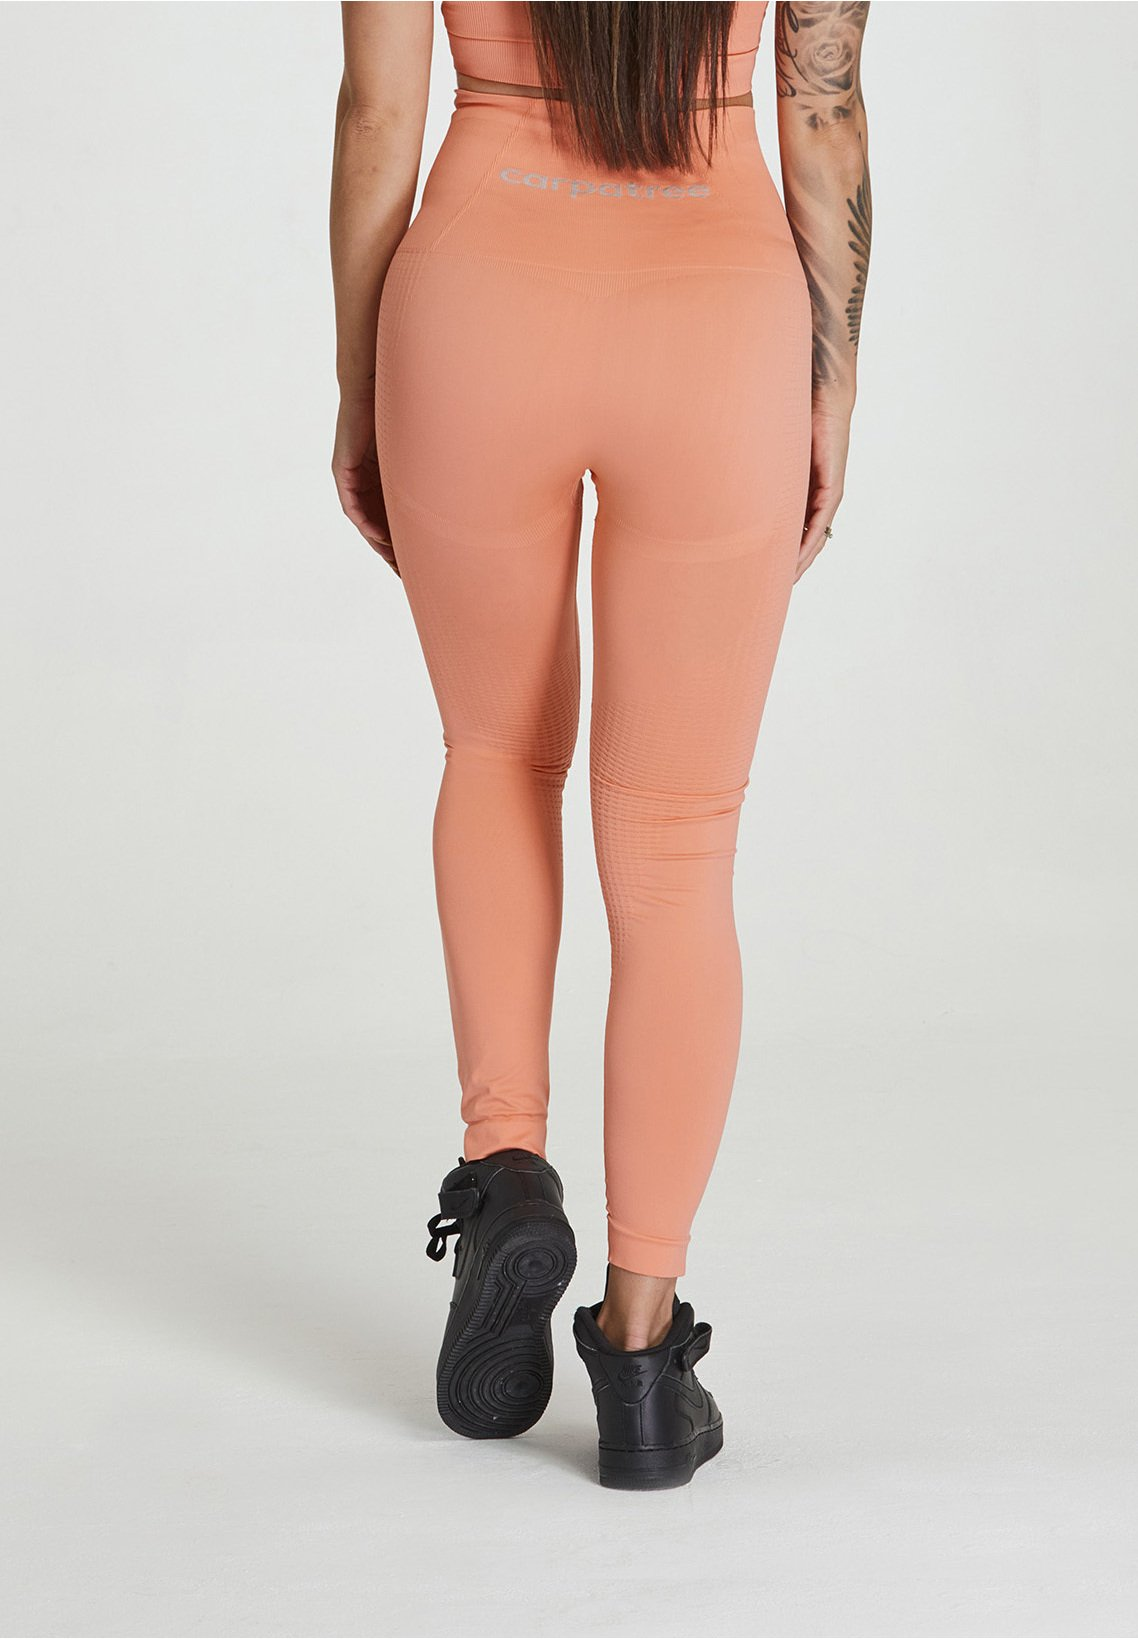 carpatree TIGHTS - Leggings - peach orange JNfEY